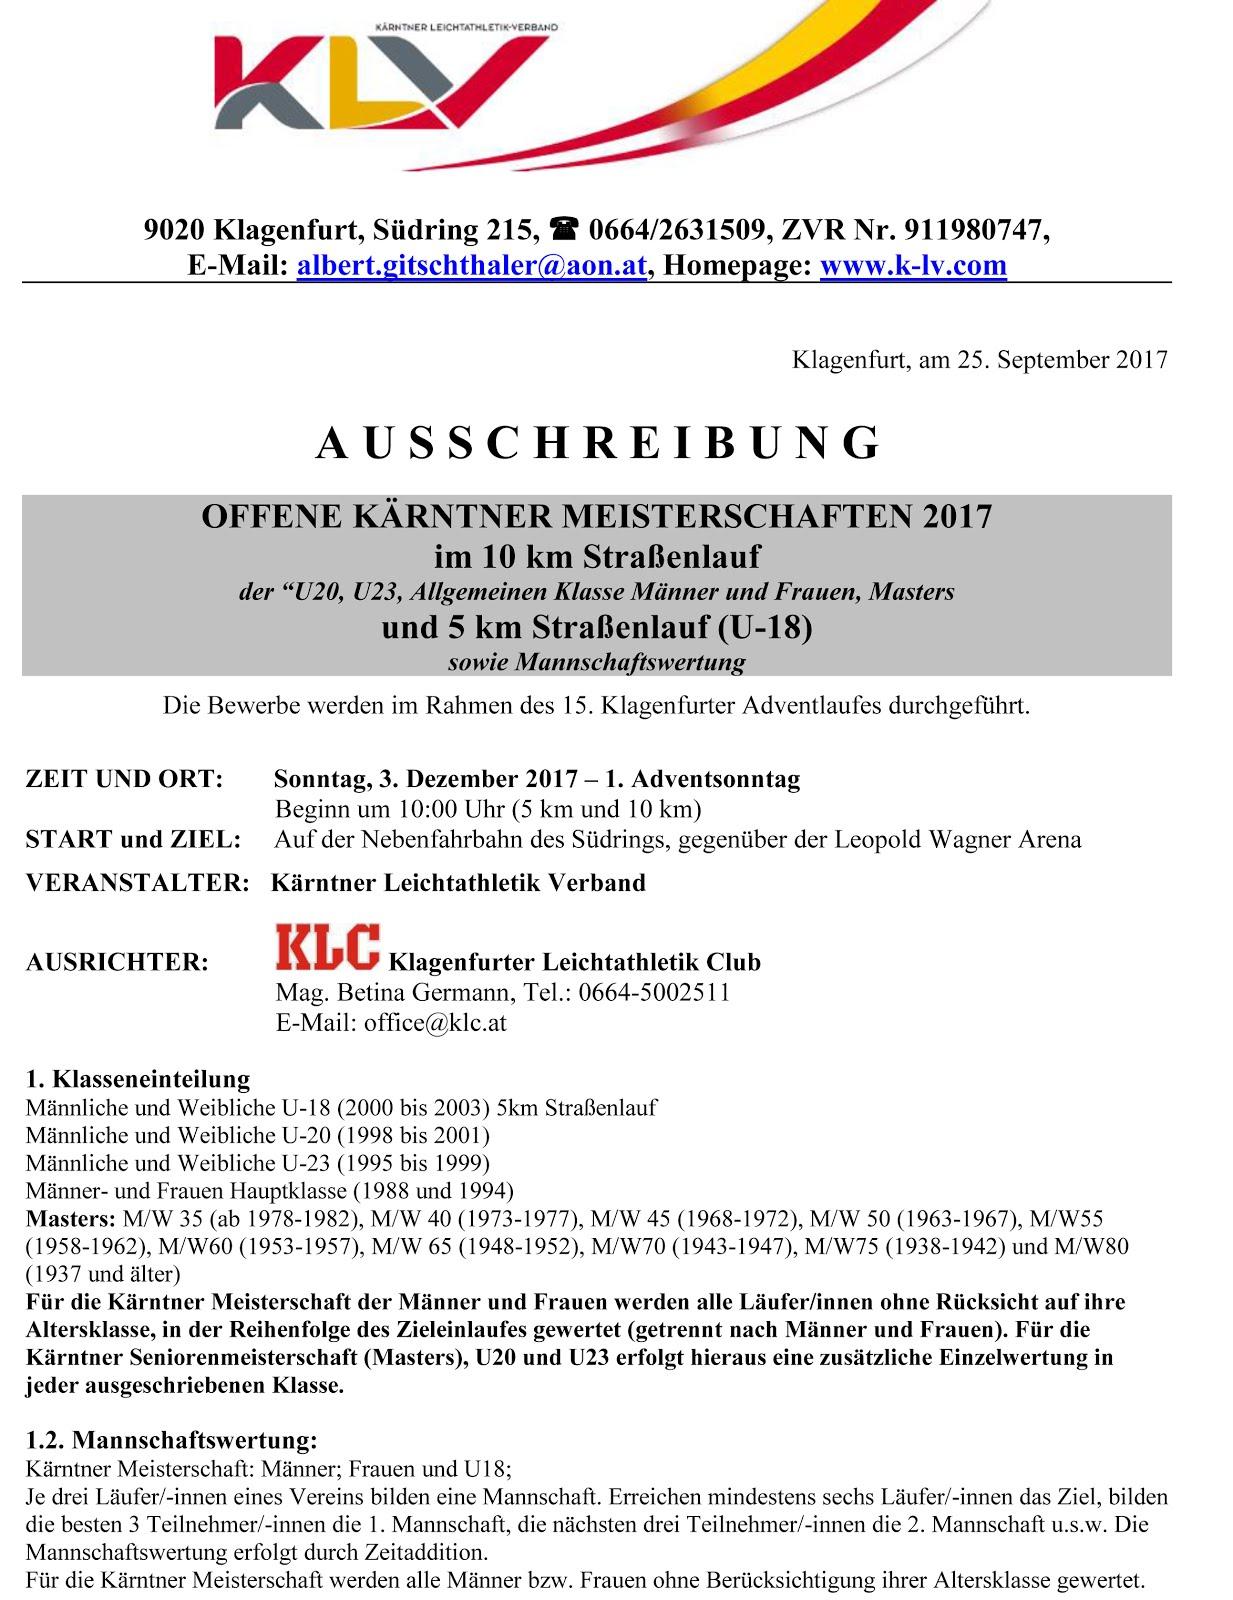 Gemütlich Ziel 18x24 Rahmen Bilder - Bilderrahmen Ideen - szurop.info